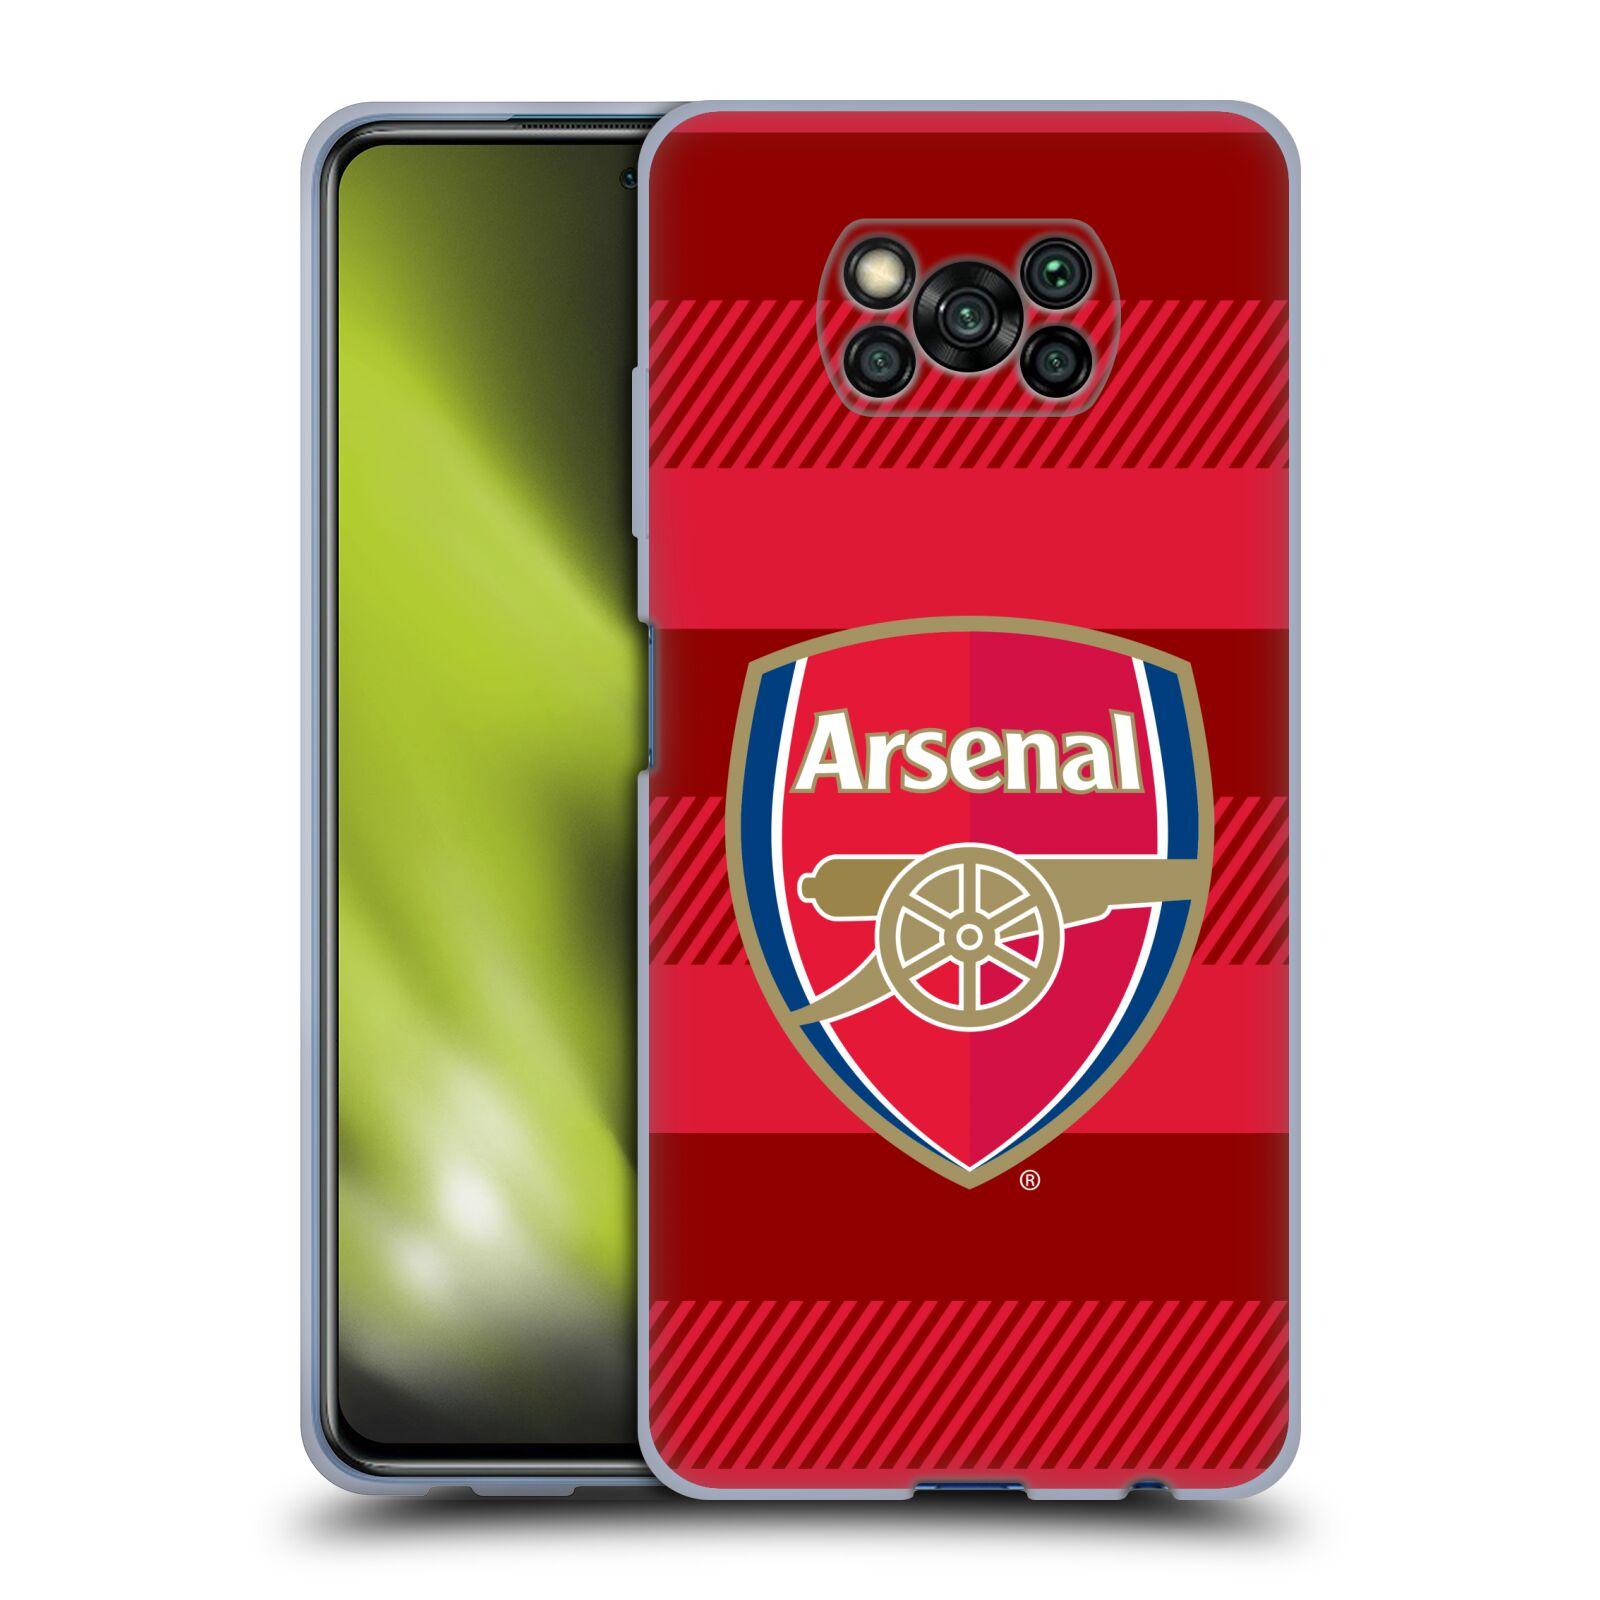 Silikonové pouzdro na mobil Xiaomi Poco X3 NFC - Head Case - Arsenal FC - Logo s pruhy